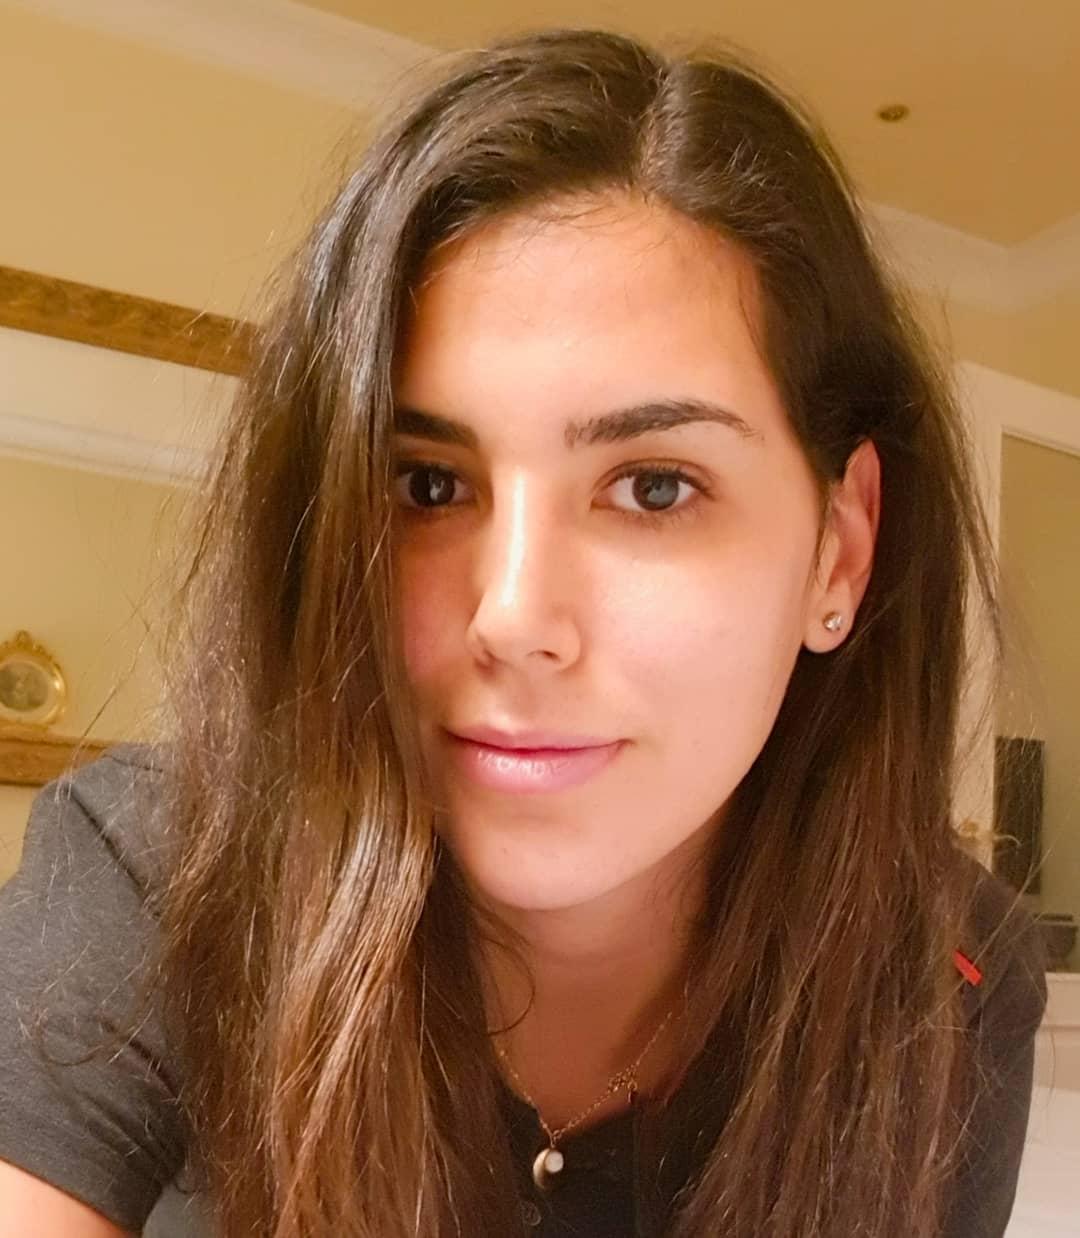 sofia del prado, top 10 de miss universe 2017/reyna hispanoamericana 2015/miss charm spain 2021. - Página 4 Sofiad10